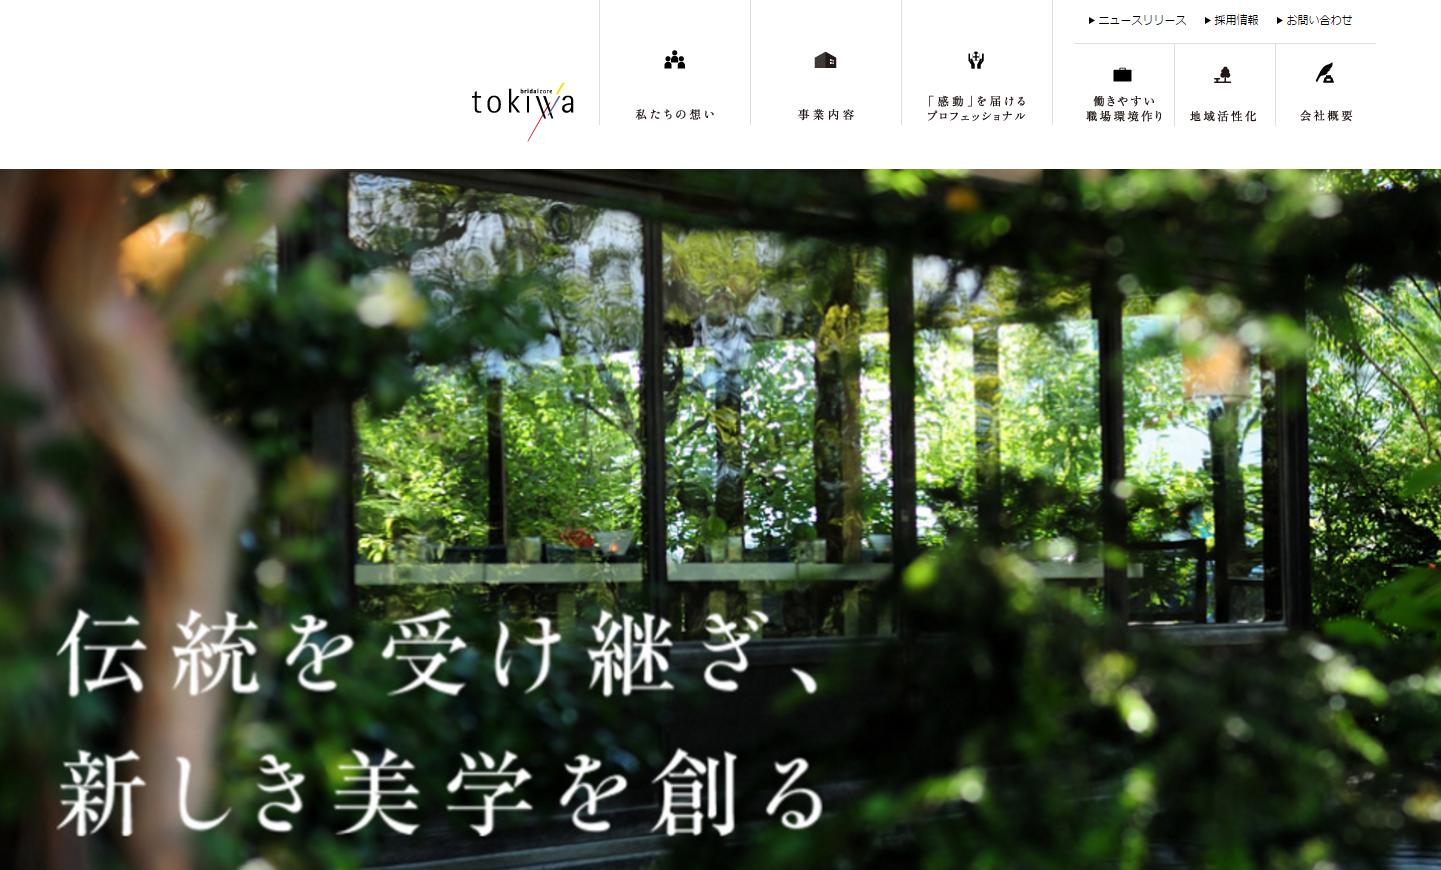 screenshot-www.bctokiwa.co.jp 2017-02-03 16-53-23